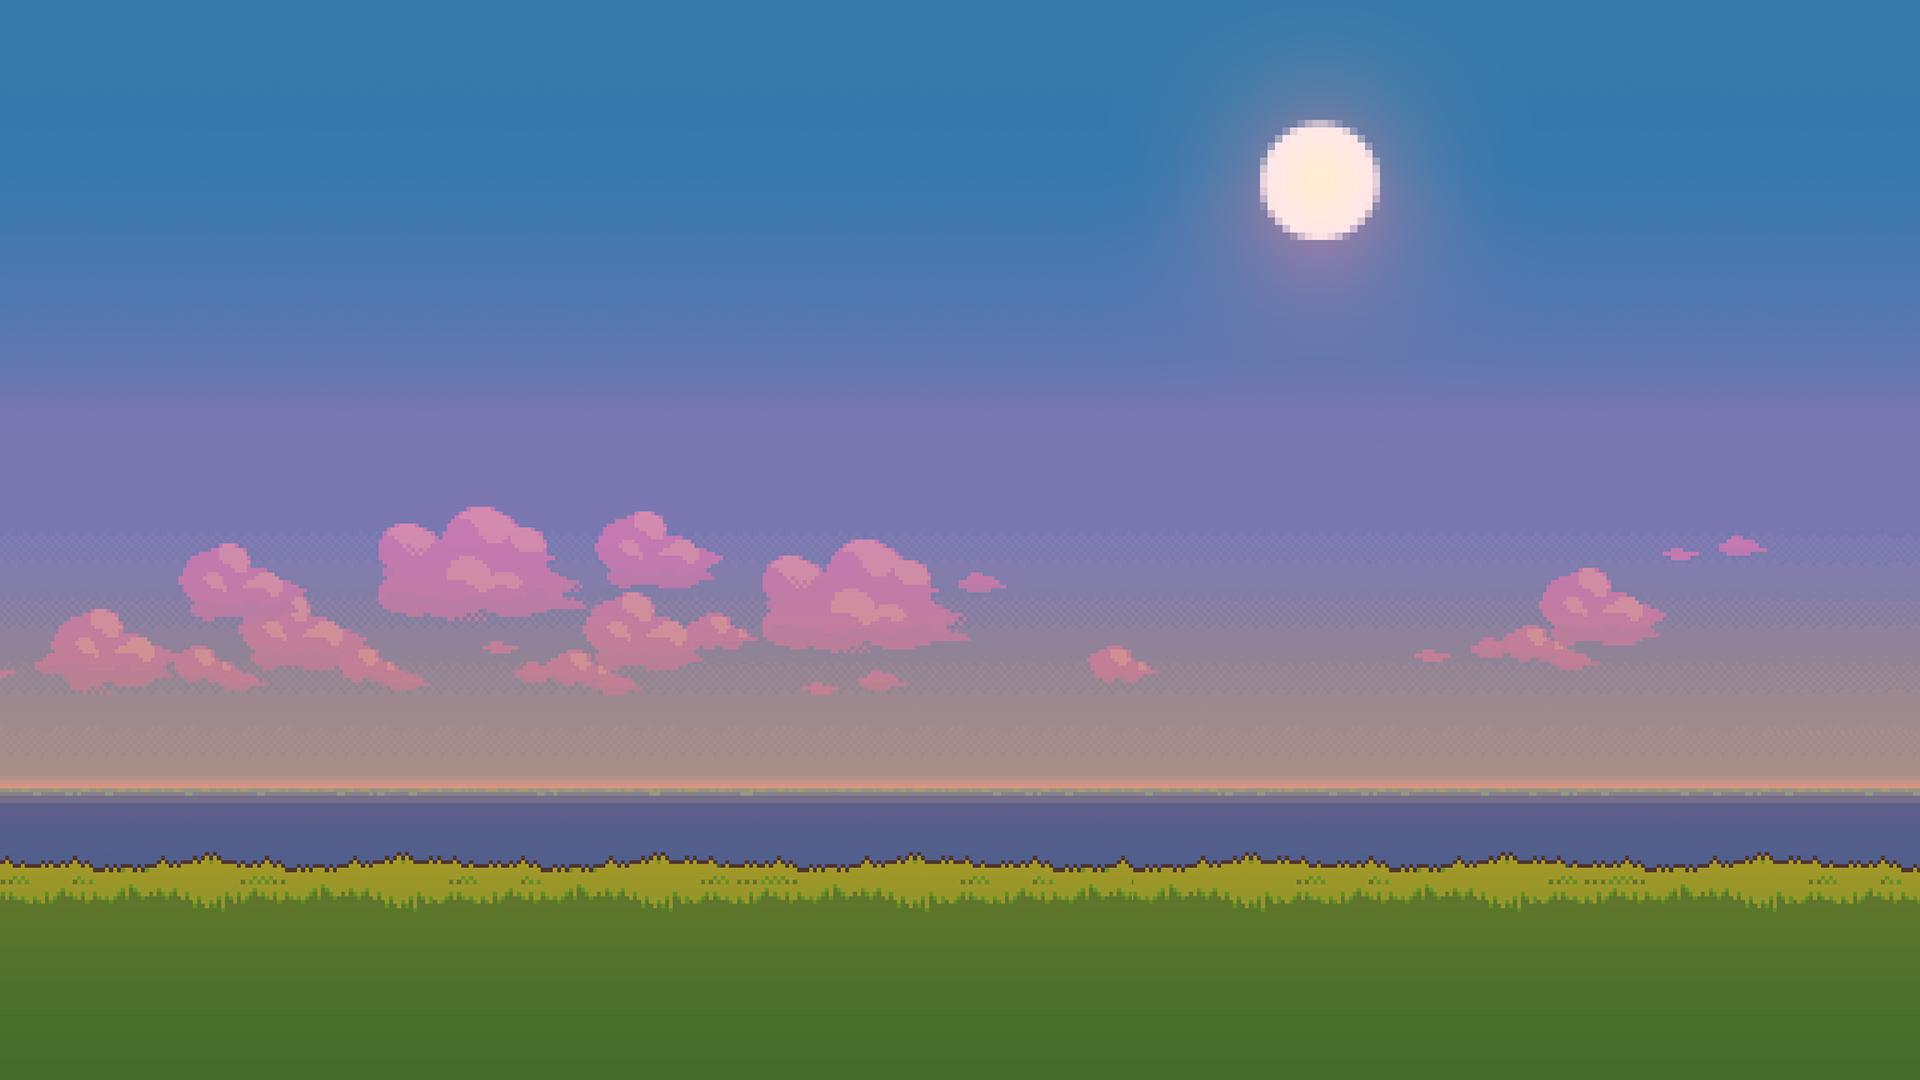 Pixel Wallpaper Tumblr   Viewing Gallery 1920x1080